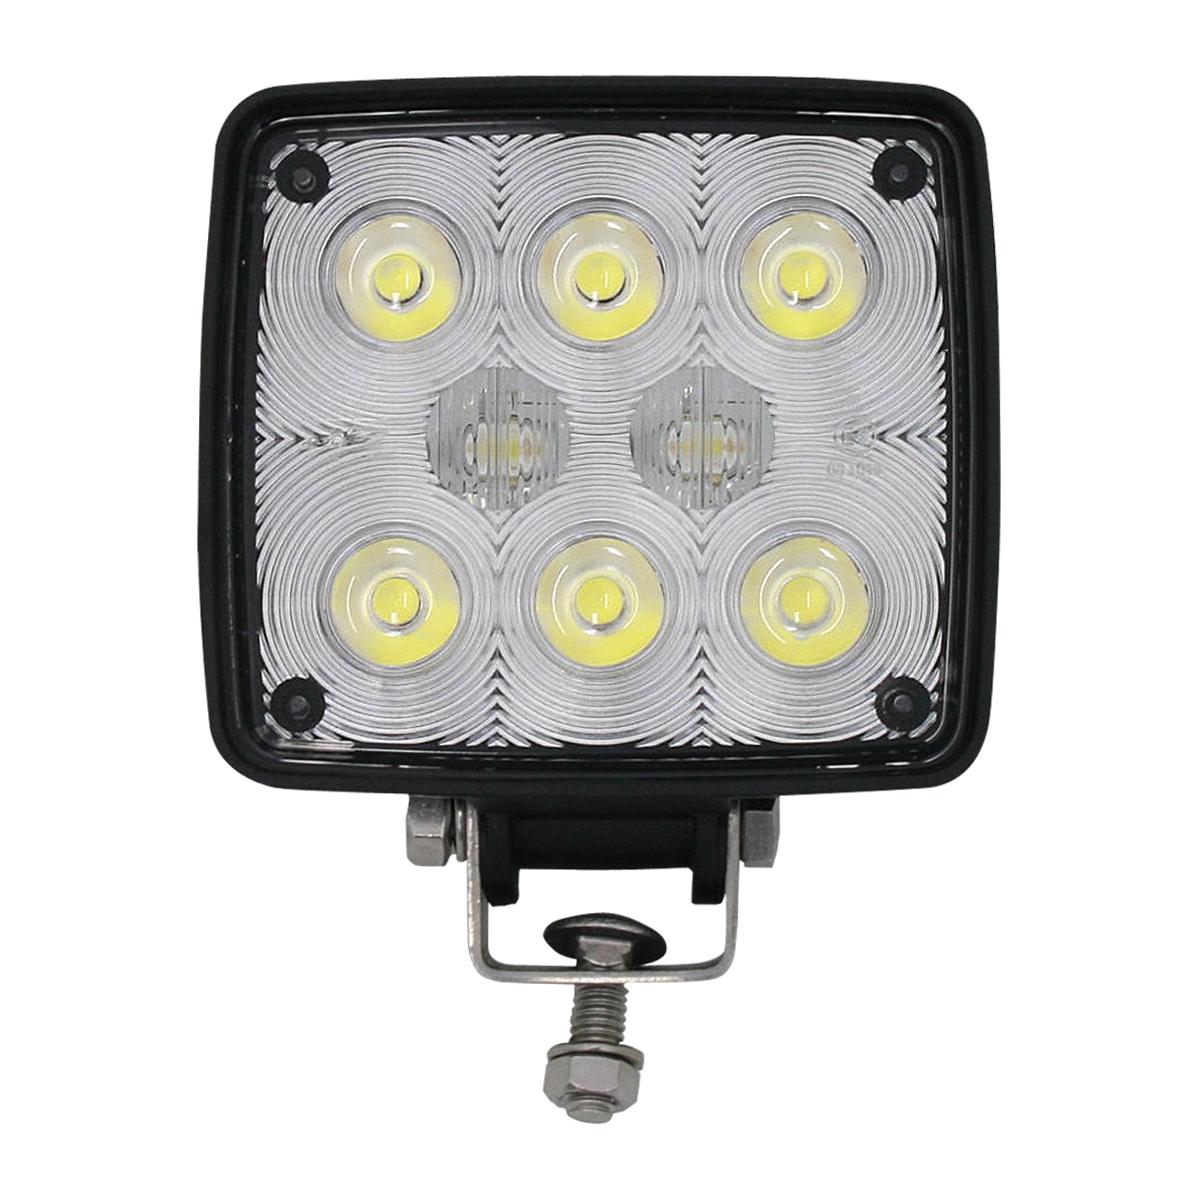 76351 Medium High Power LED Work Light